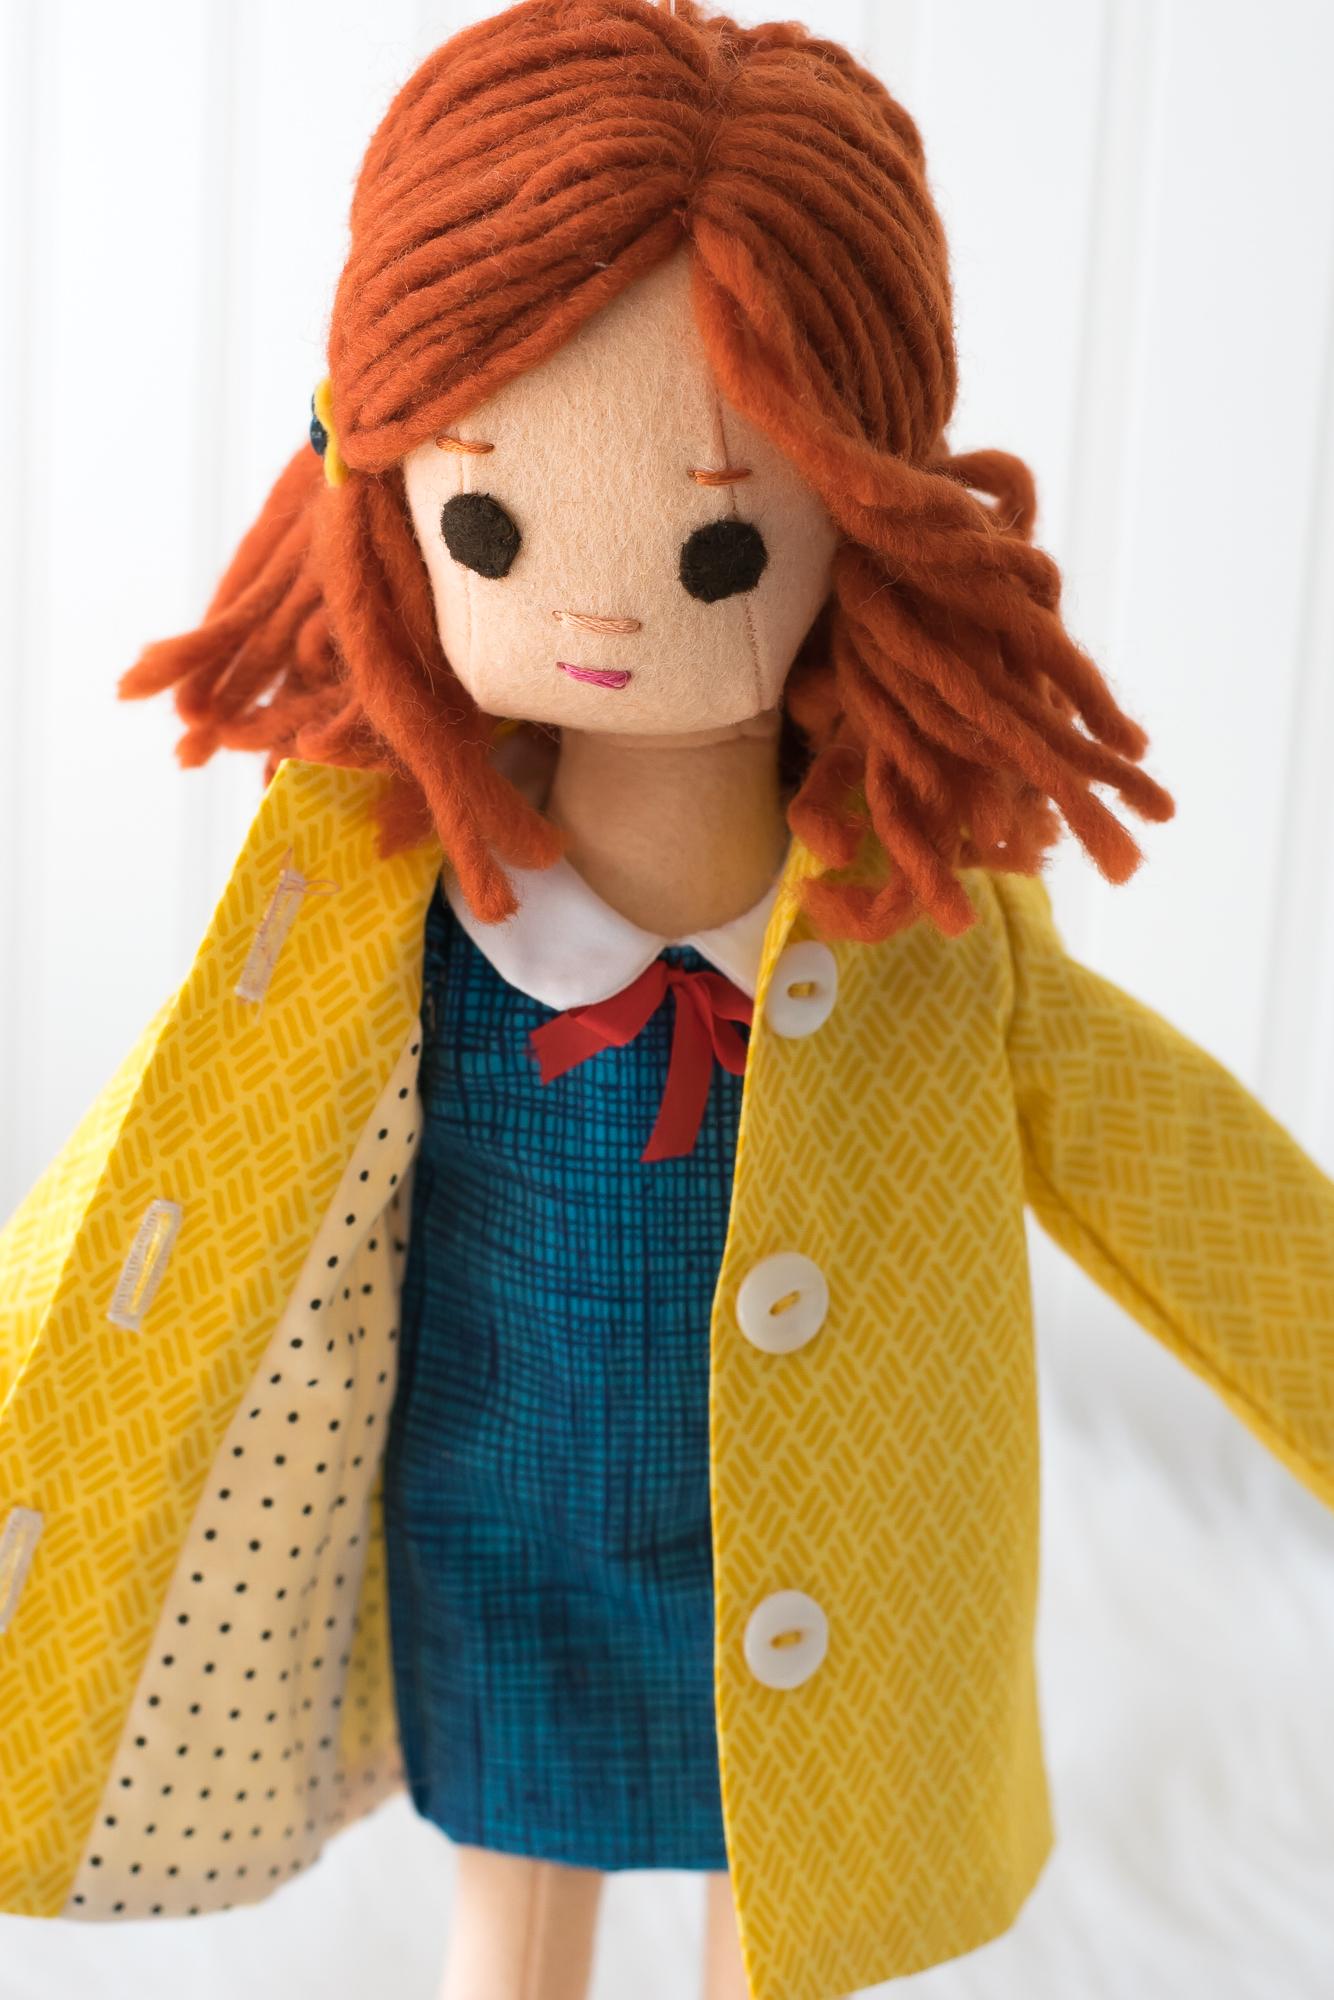 Gallery of Dolls-9.jpg